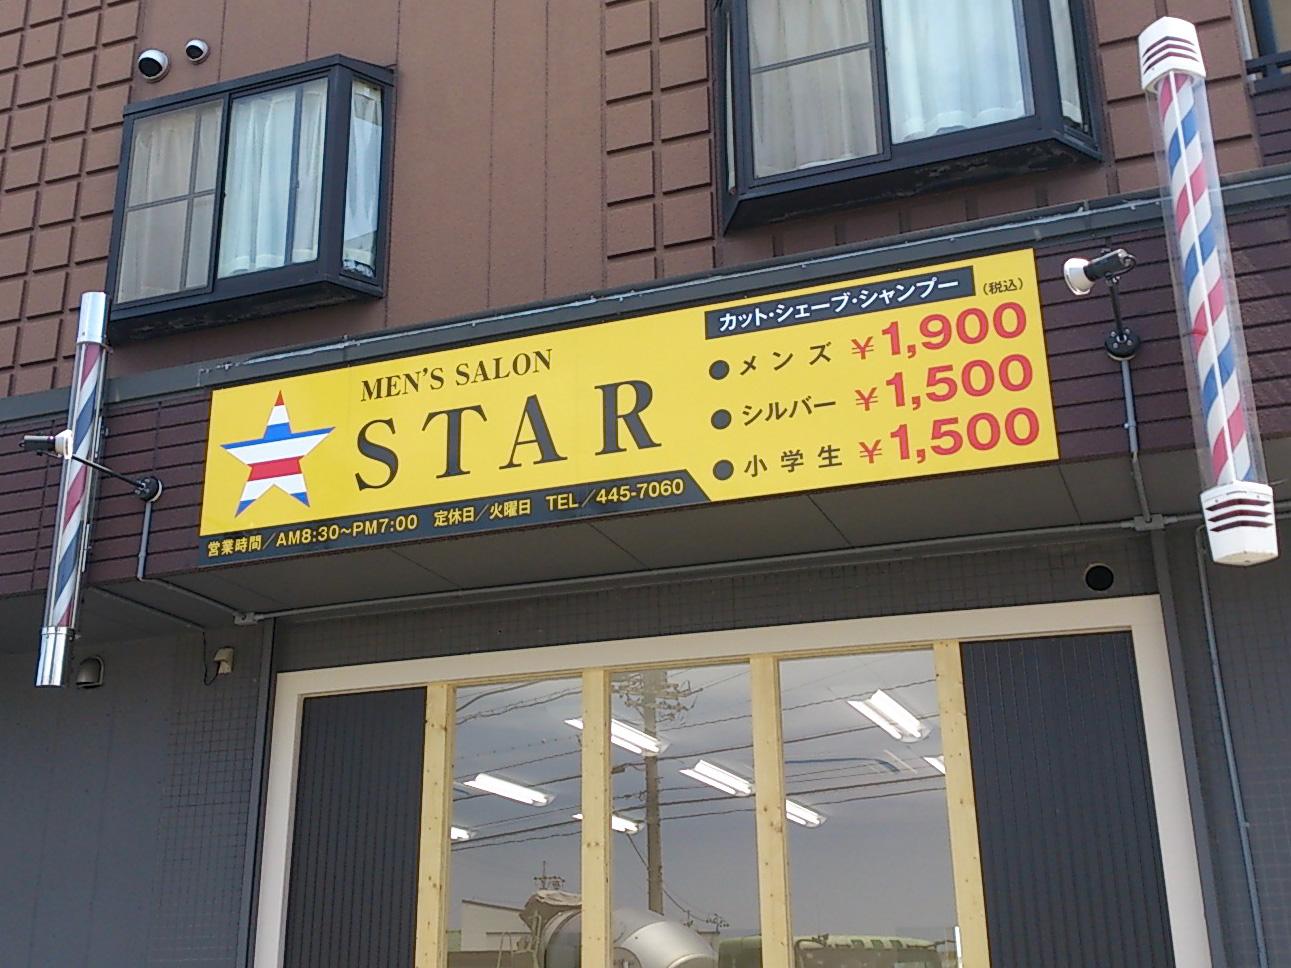 MEN'S SALON STAR 様